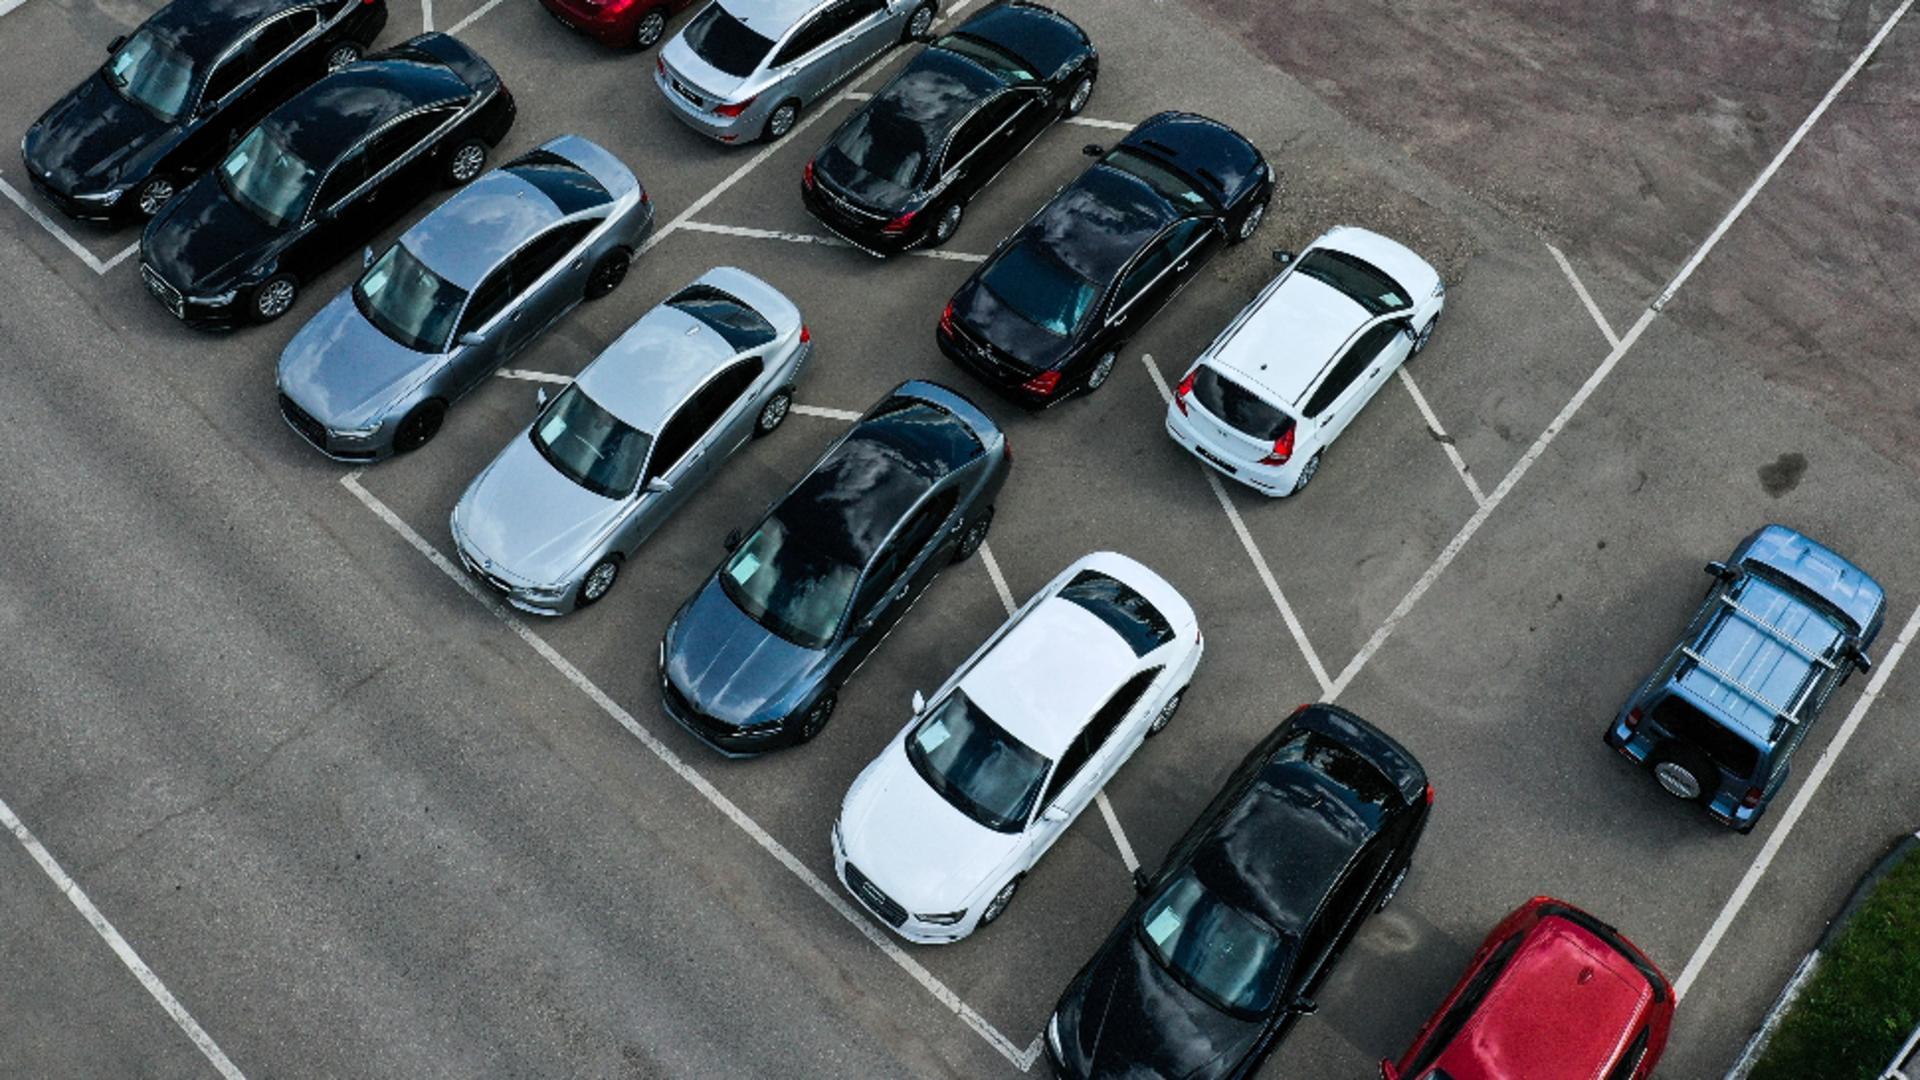 Noi mașini scoase la vânzare de ANAF / Foto: Profi Media, Valery Sharifulin/TASS